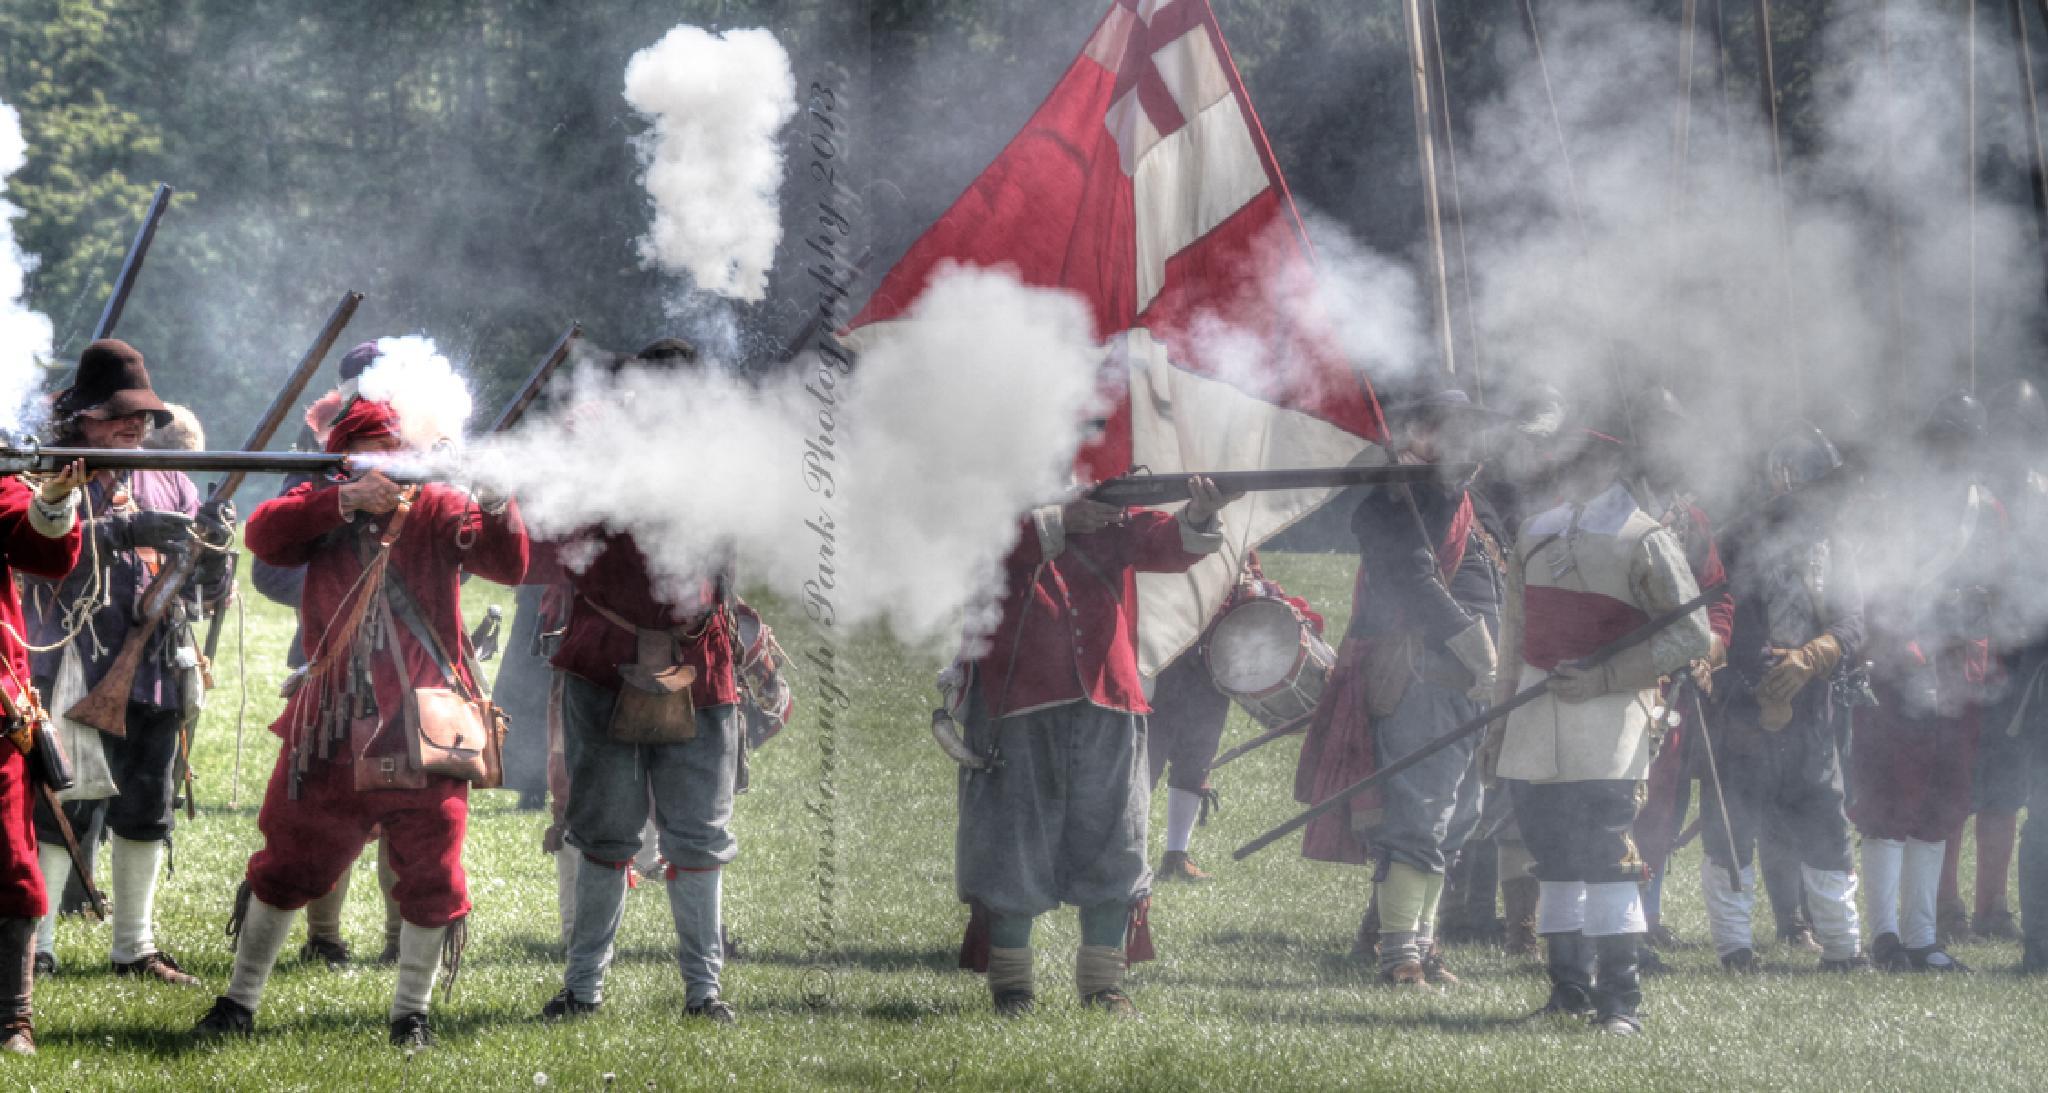 Civil War Re-Enactment at Blenheim Palace by Gainsborough Park Photography